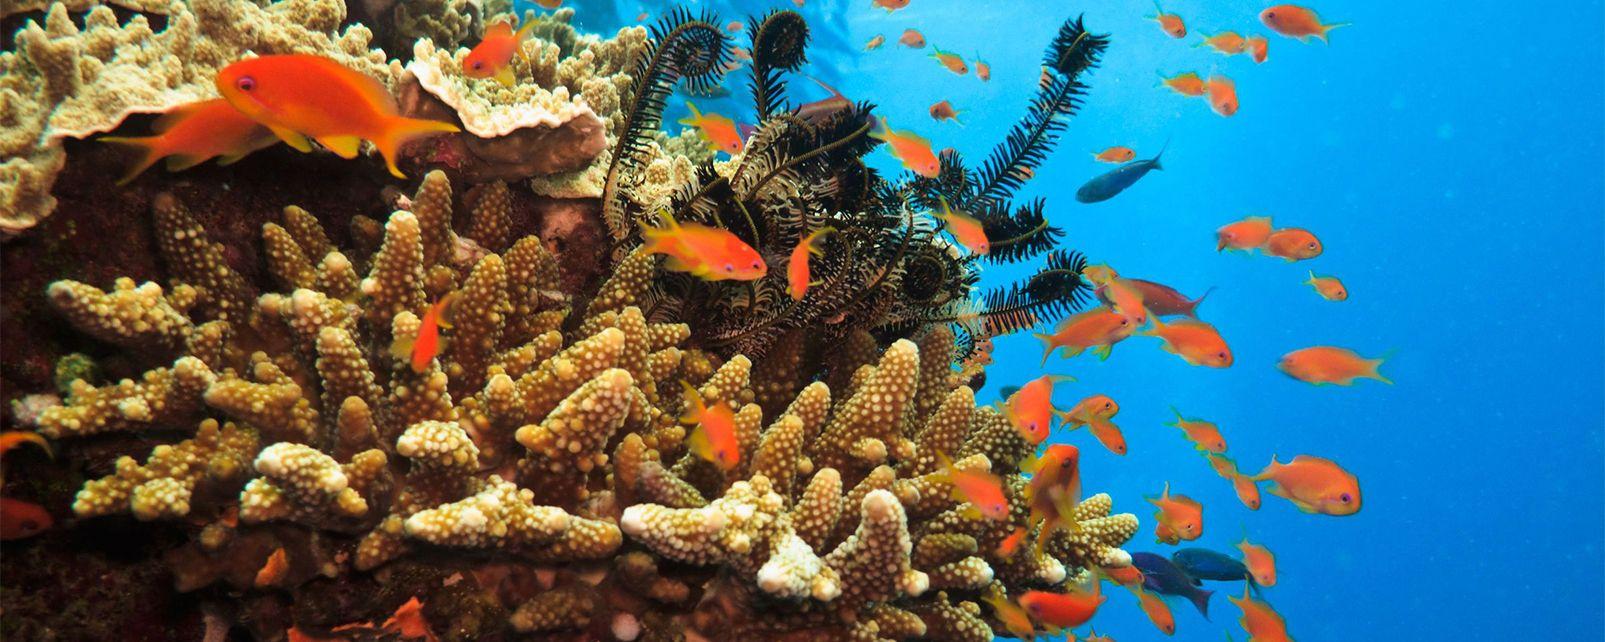 La vida submarina , La gran barrera de coral , Australia